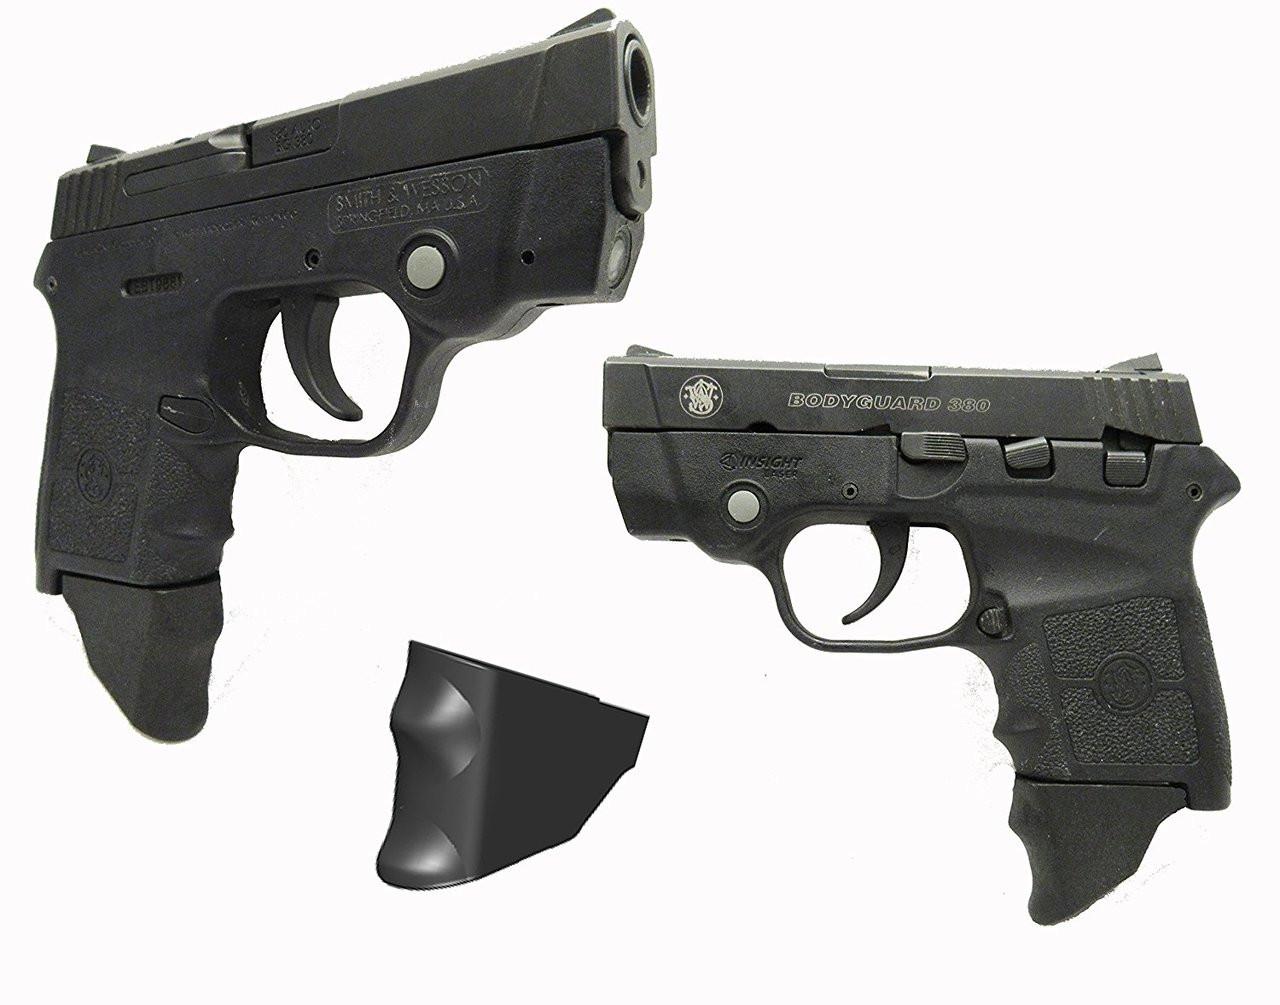 Grip Extension Fits Smith & Wesson Bodyguard 380 & M&P Bodyguard 380